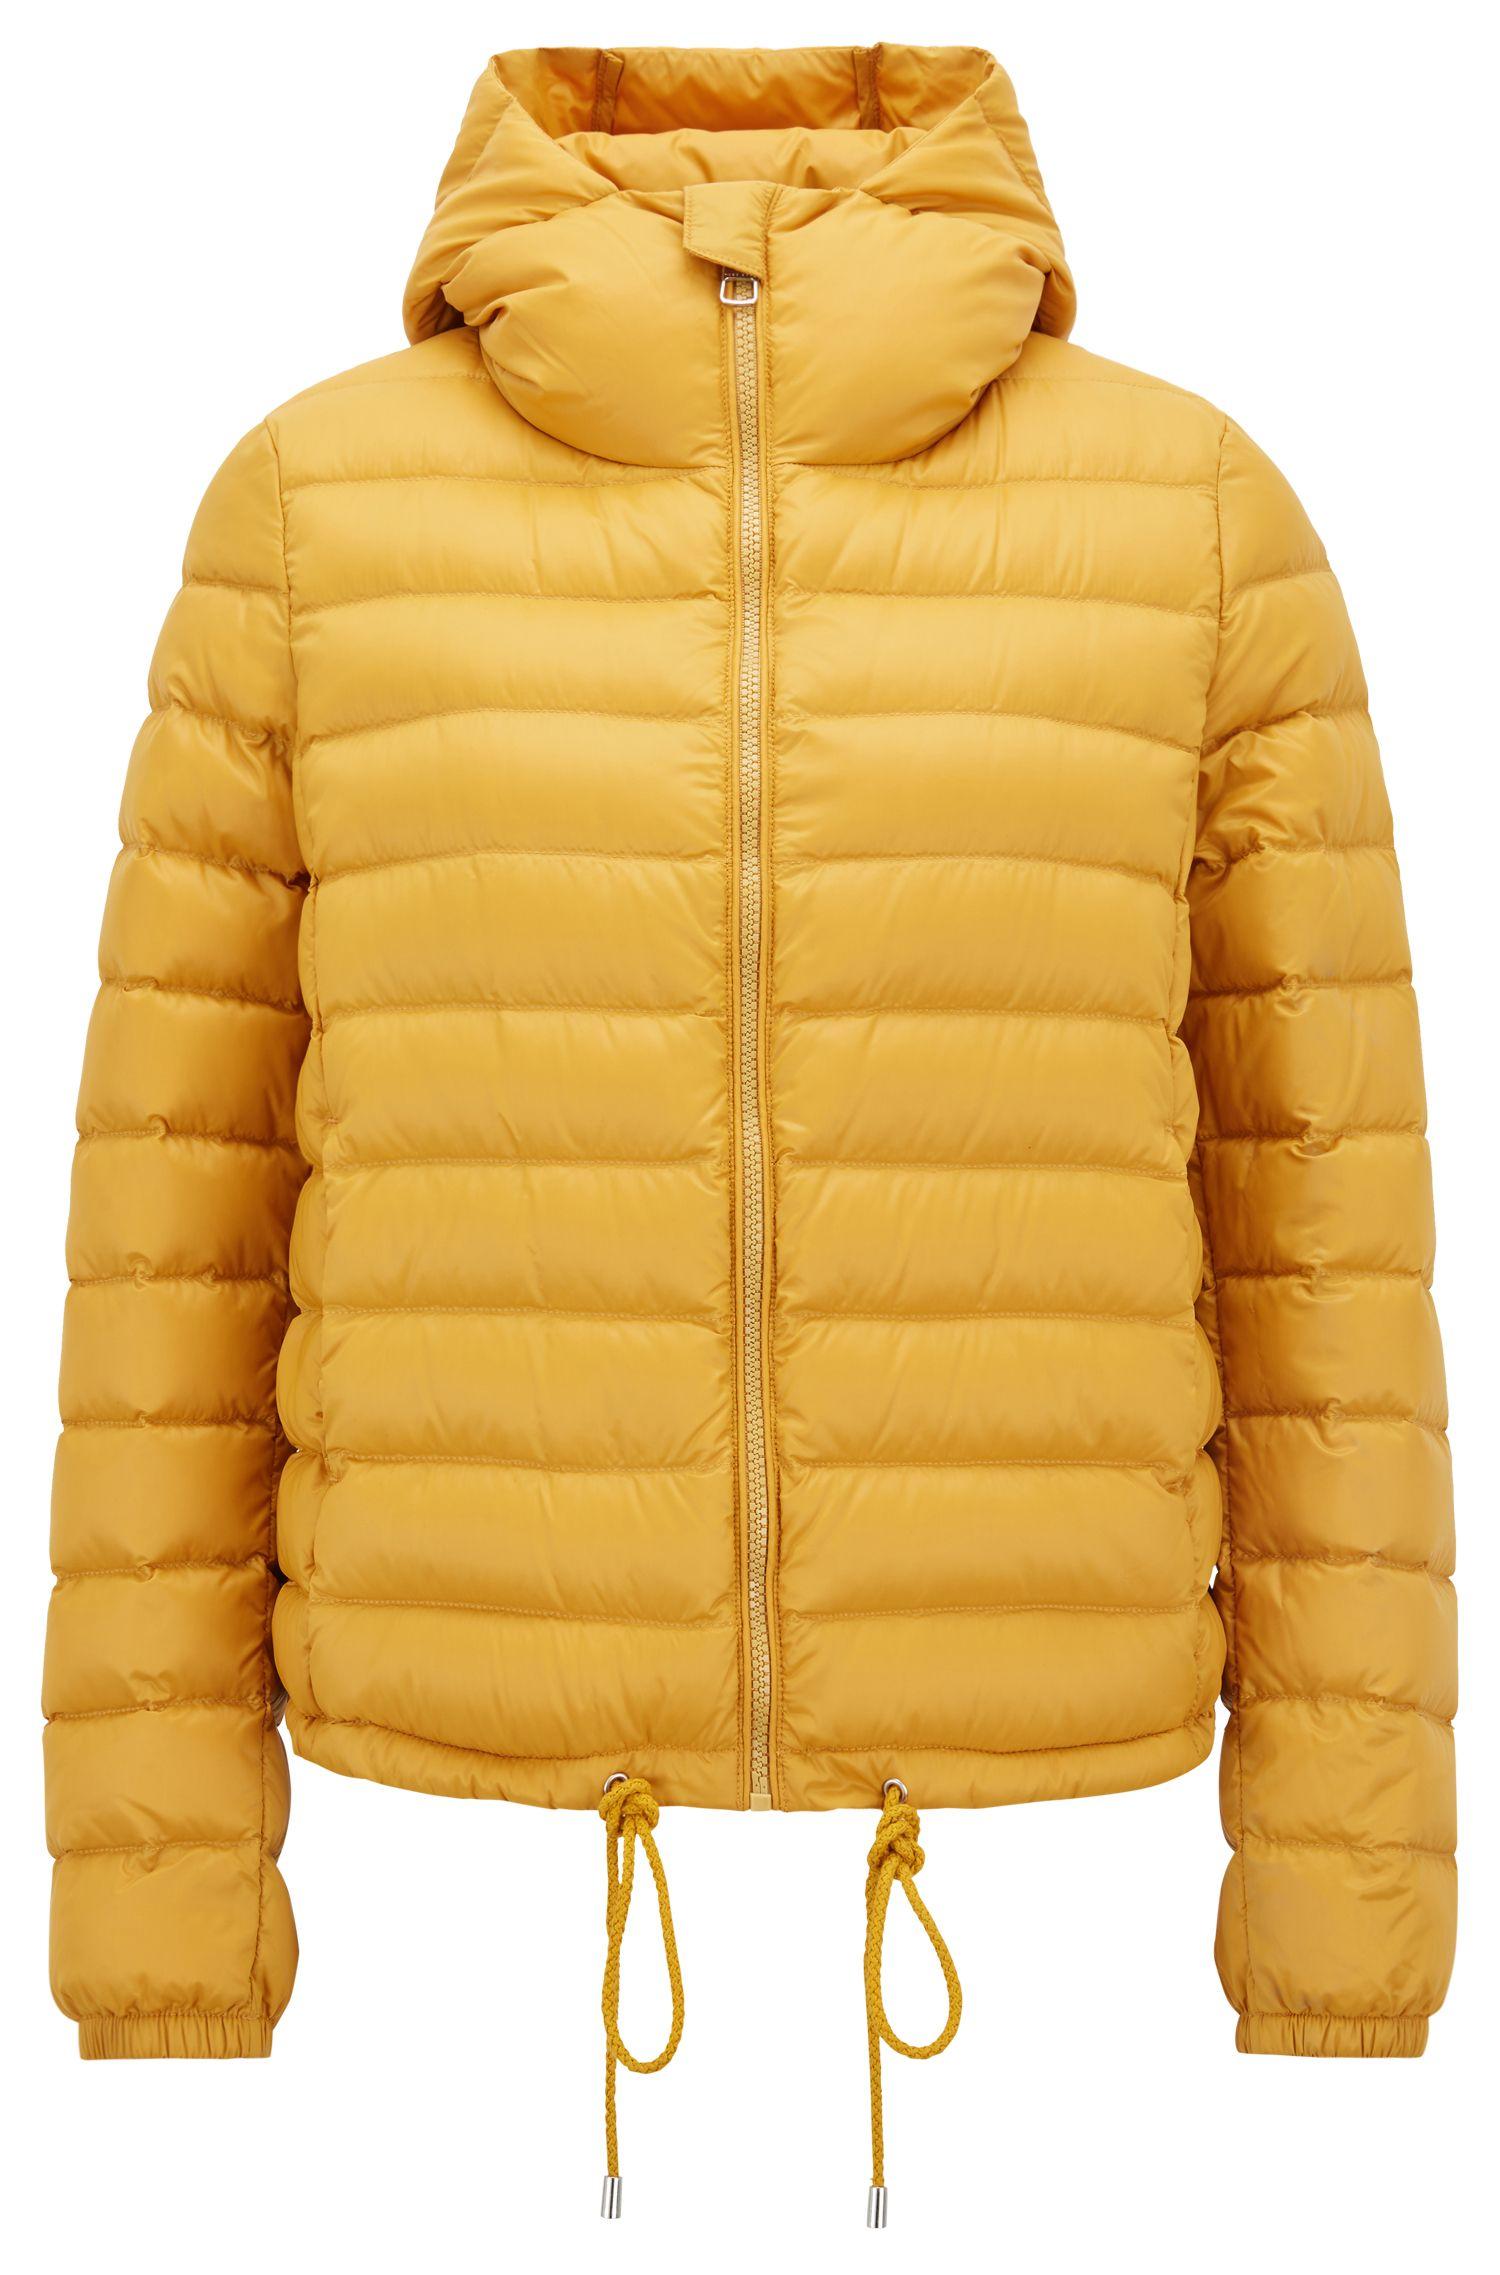 Lichte jas met donsvulling en waterafstotende buitenkant, goud